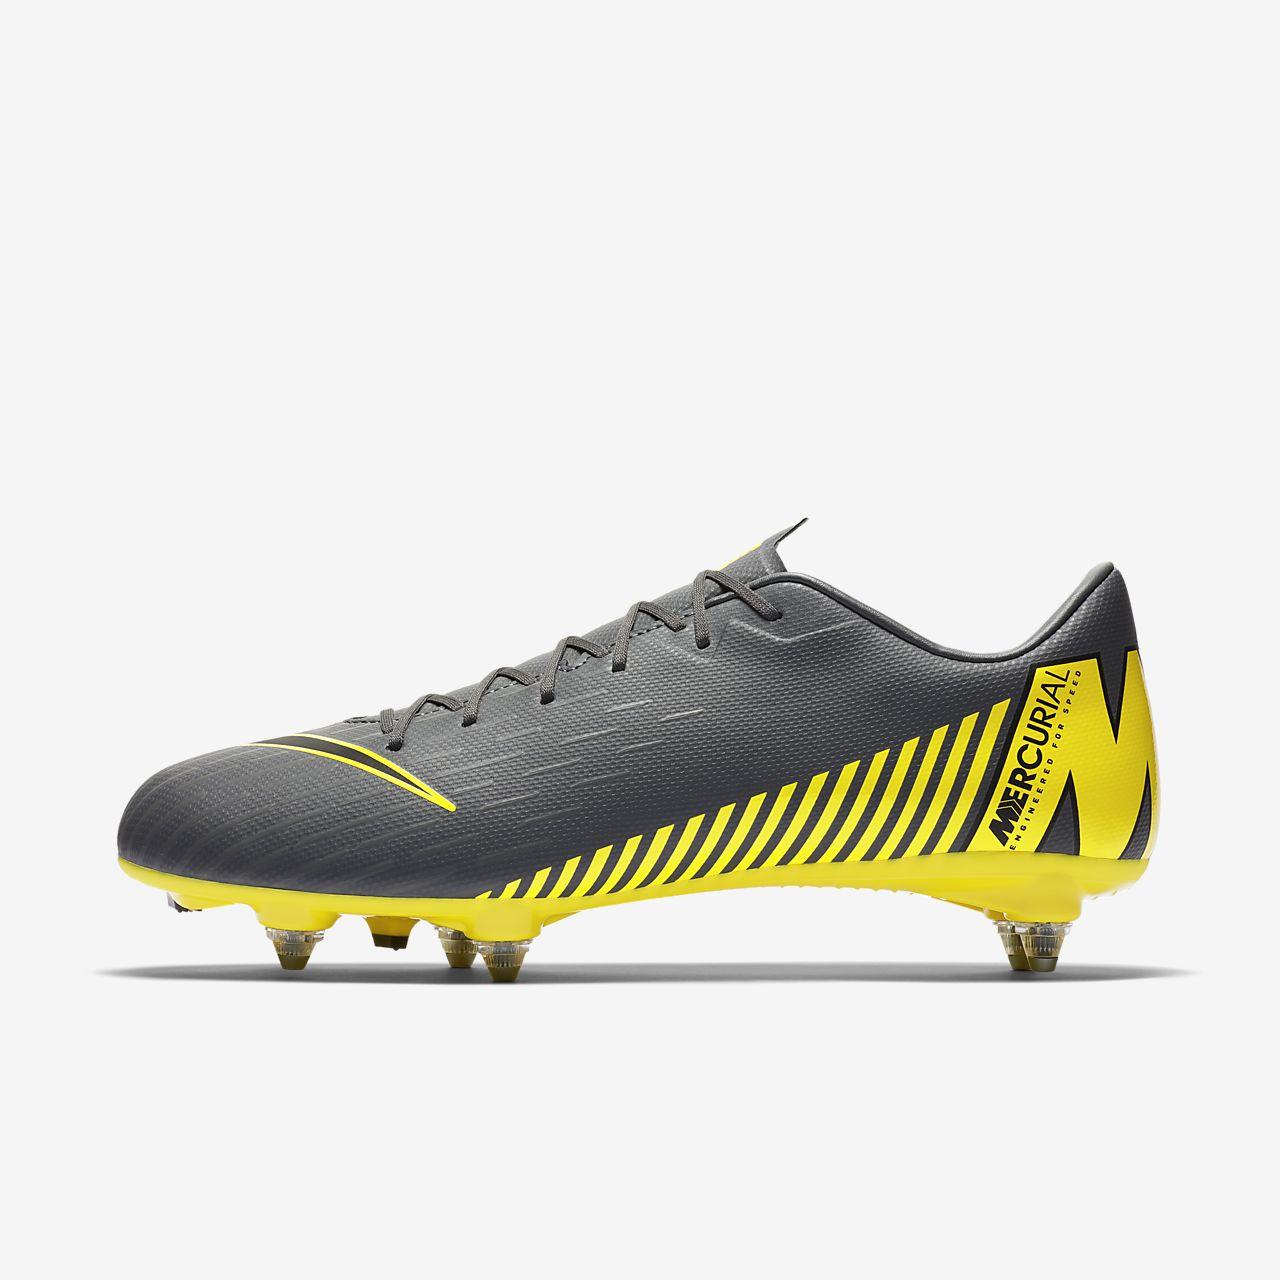 Nike Mercurial Vapor XII Academy SG-PRO Soft-Ground Football Boot